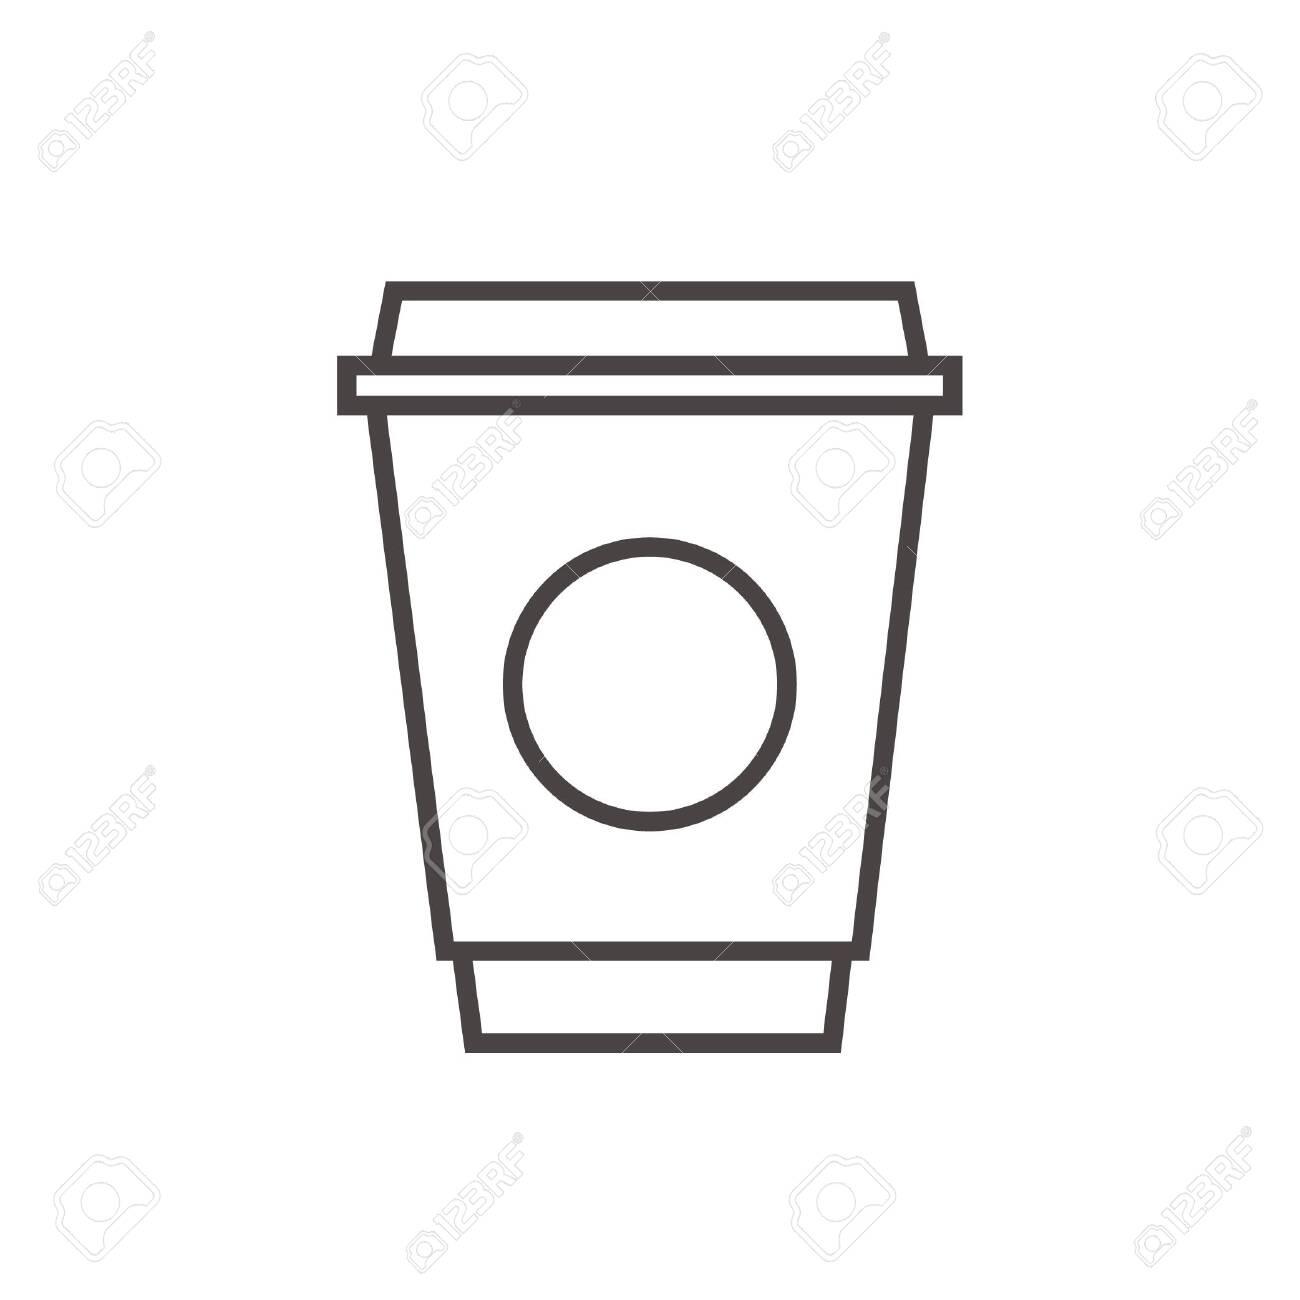 hot coffee stroke outline icon vector - 126511454